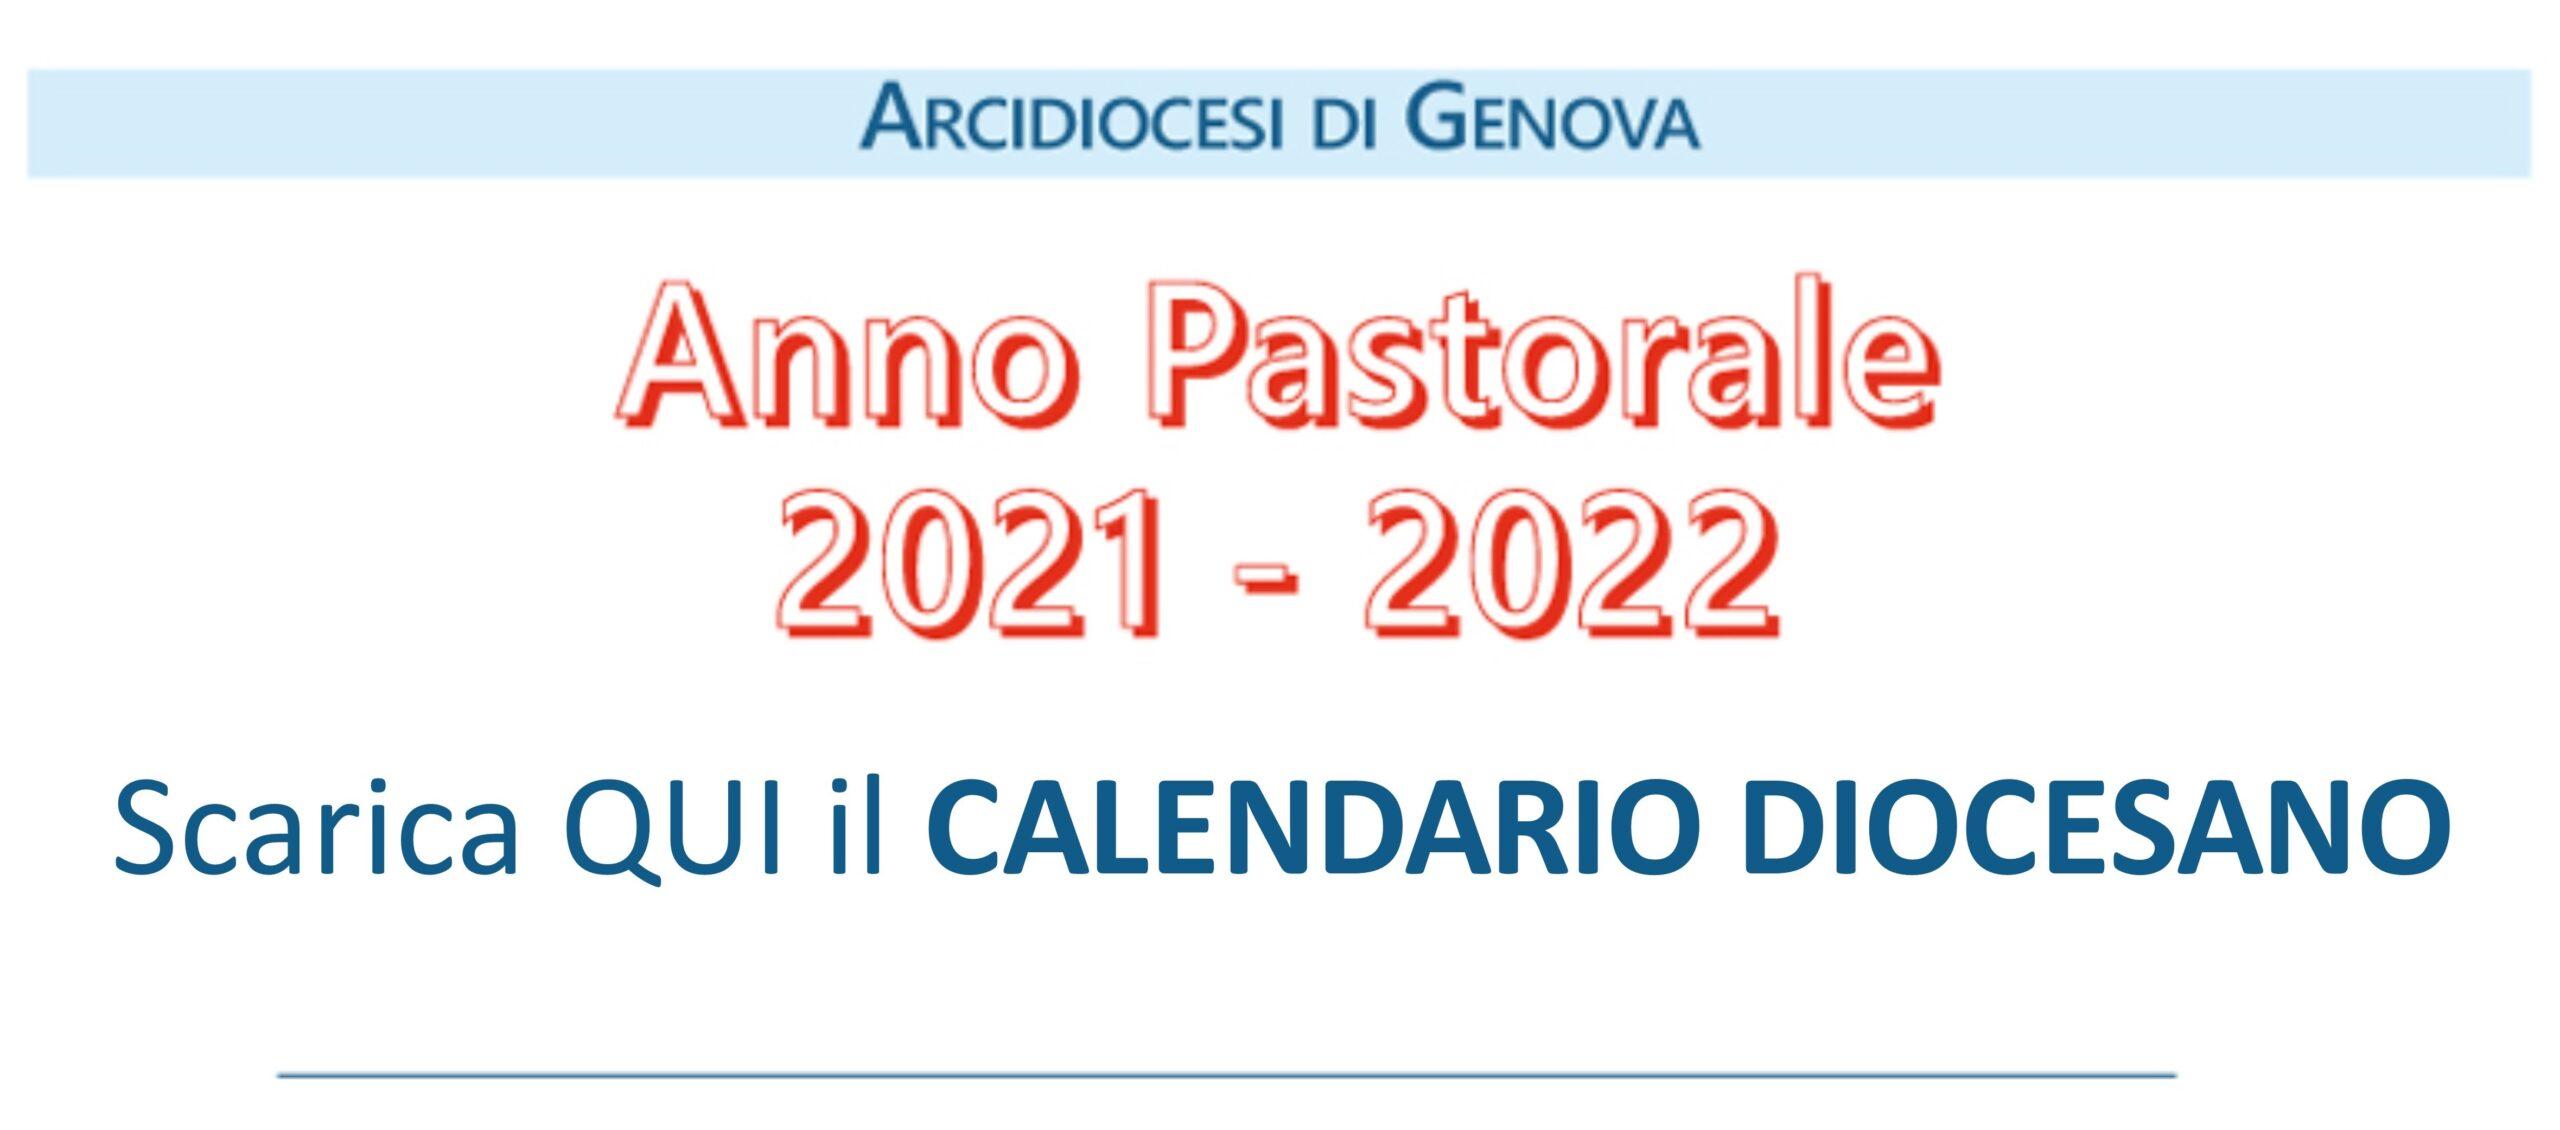 https://www.chiesadigenova.it/wp-content/uploads/sites/2/2021/09/calendario2021_2022_OK_4pagine.pdf